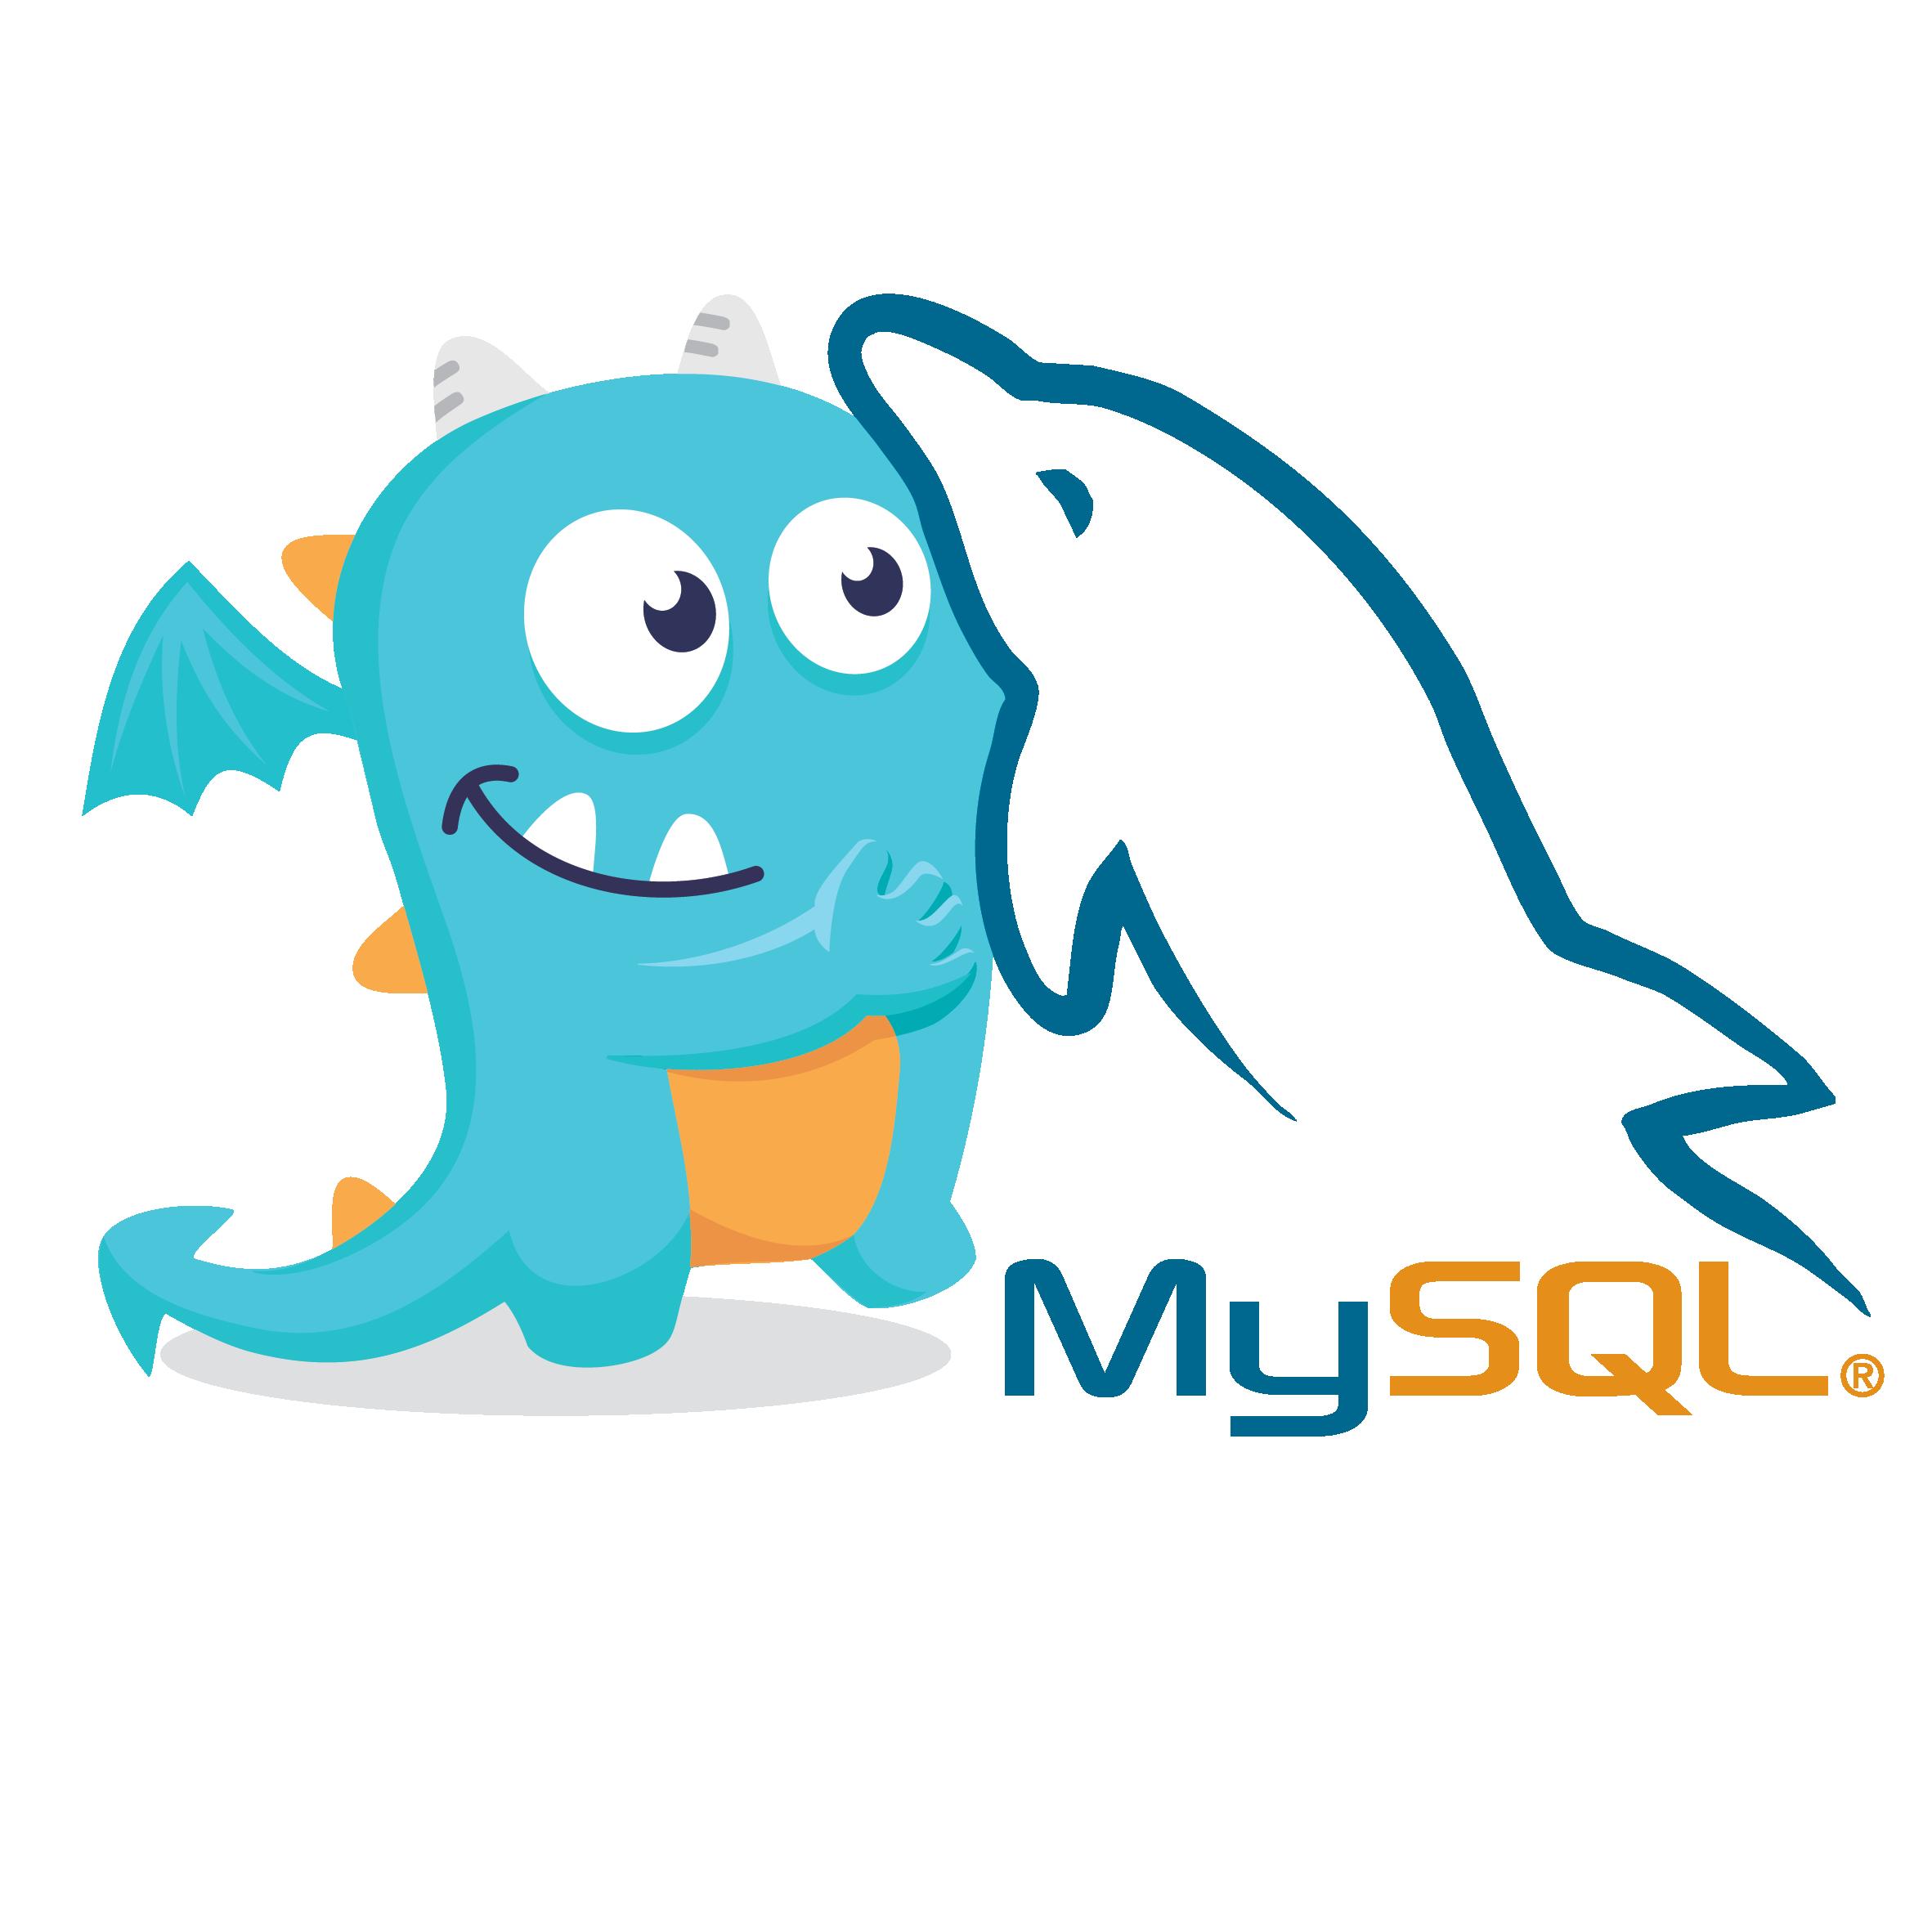 New dragon: with MySQL logo